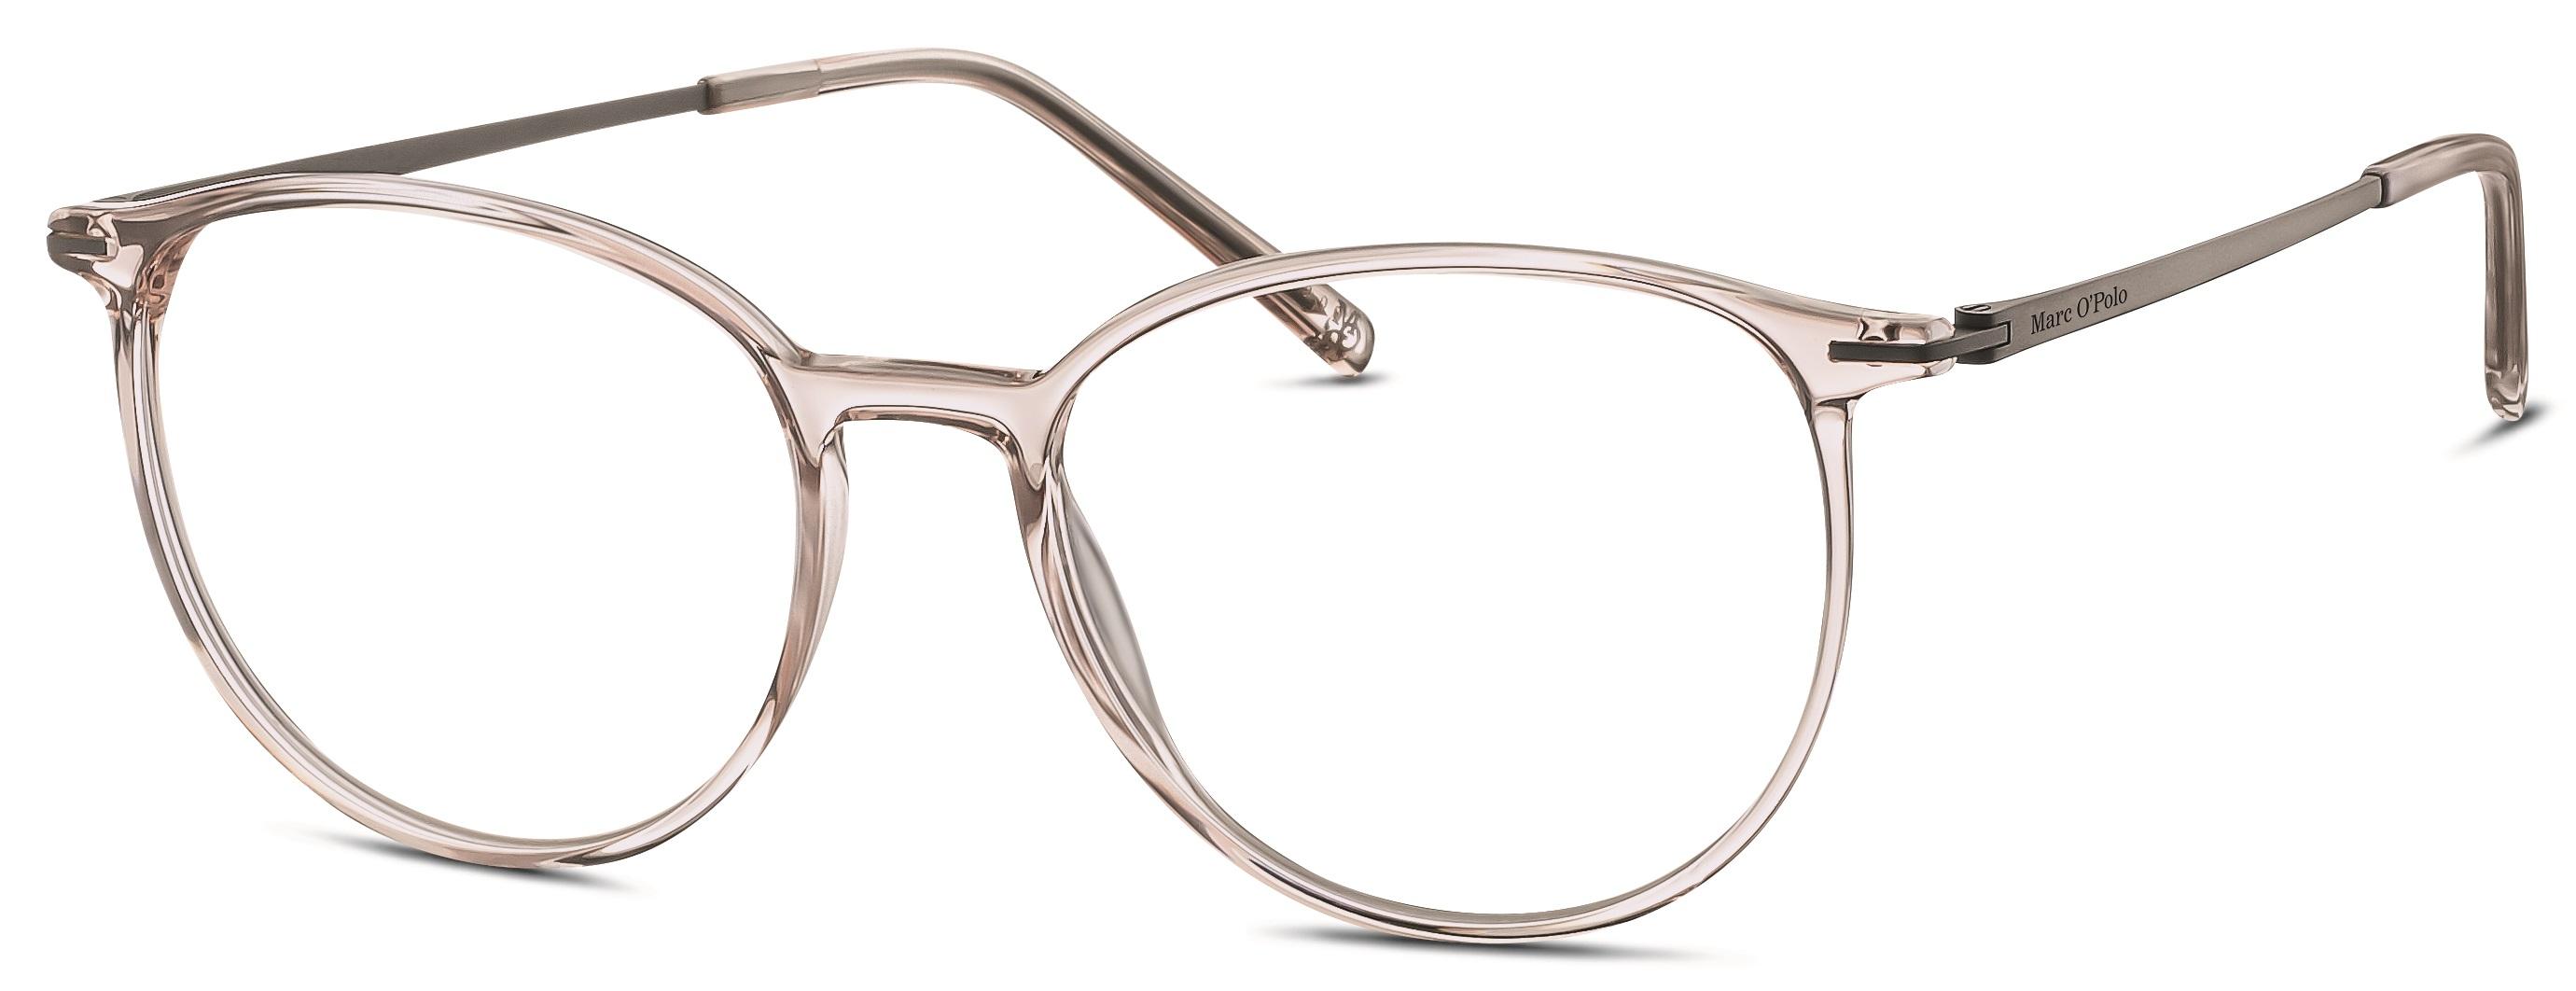 MARC O'POLO Eyewear  503148 50